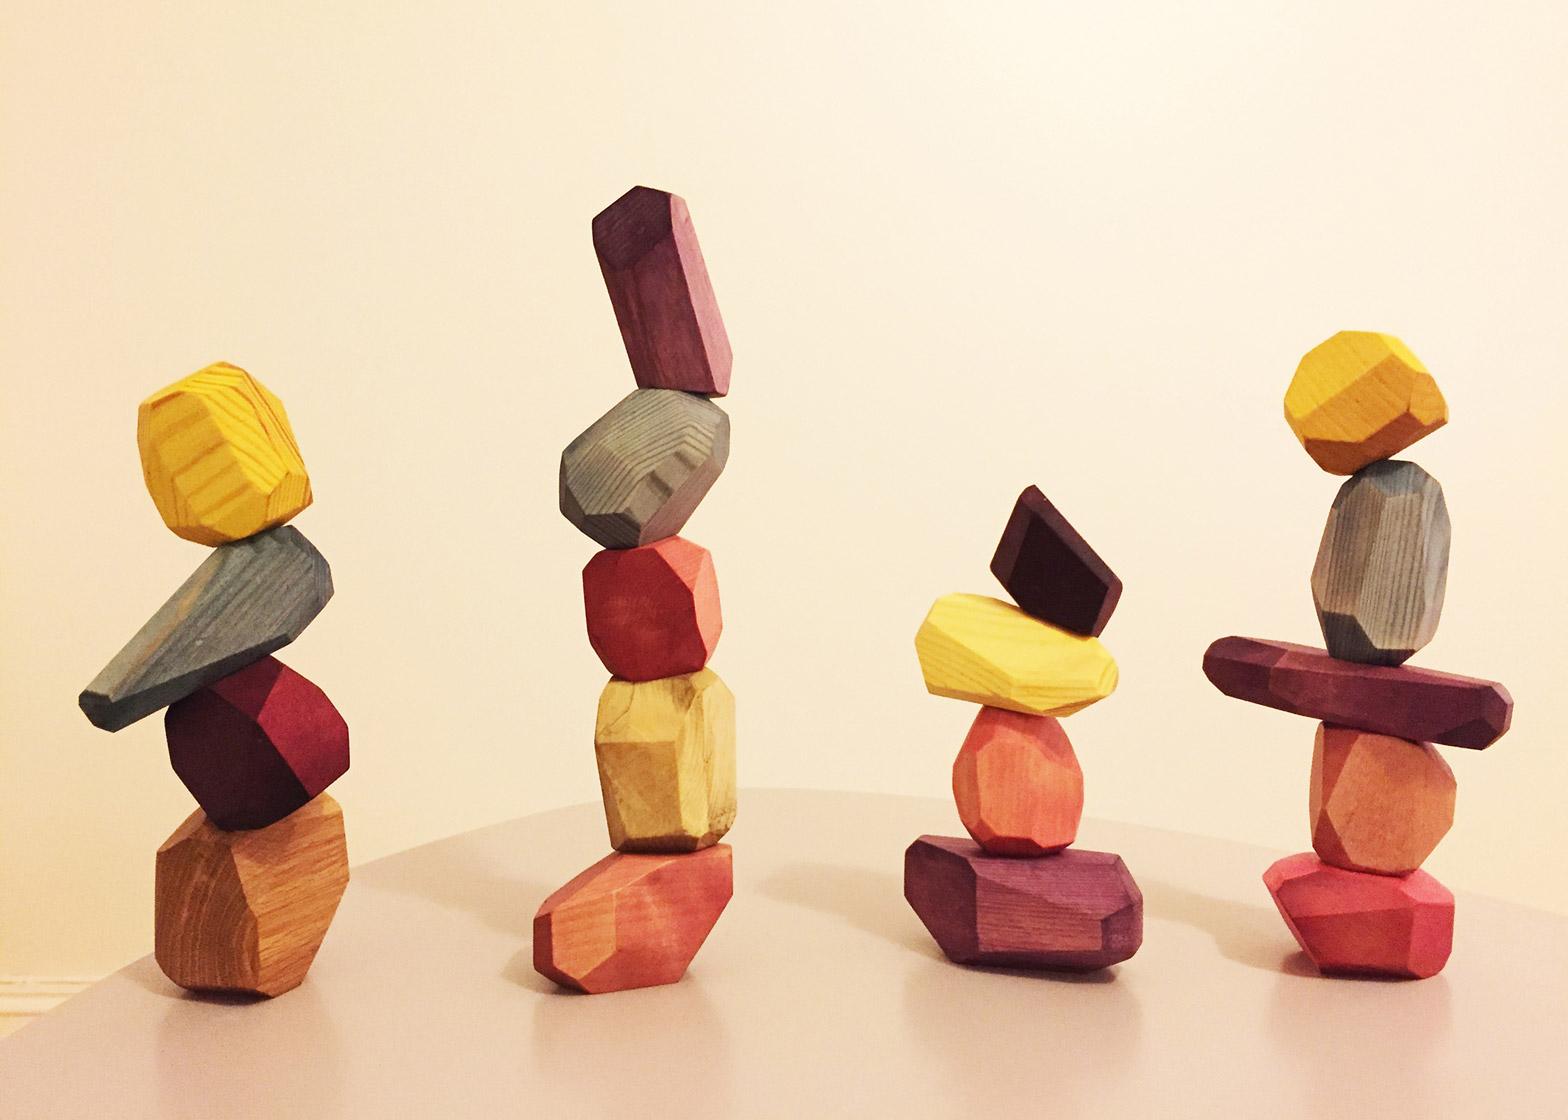 Katarina_Hornwall-Gabriella_Rubin-Snego-building-blocks-hisheji (1)